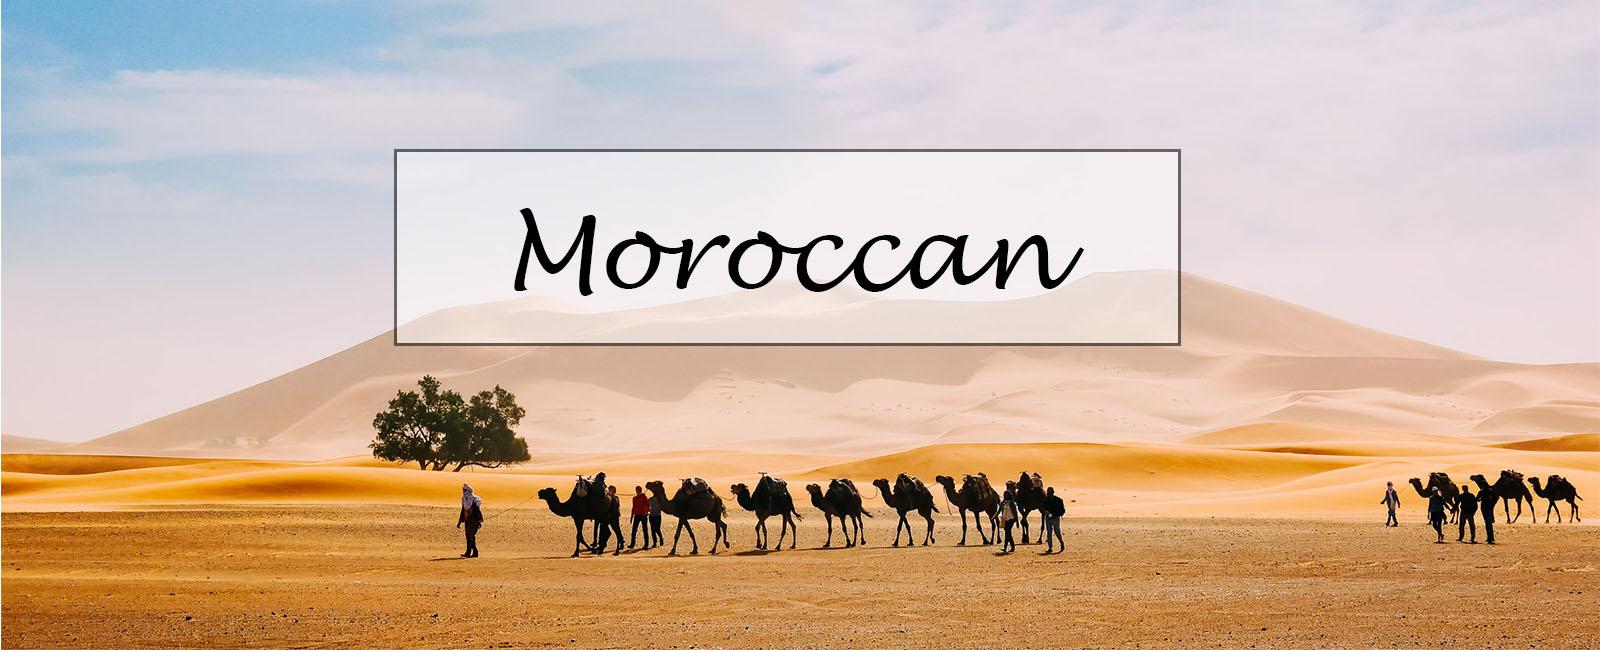 Moroccan desert-s